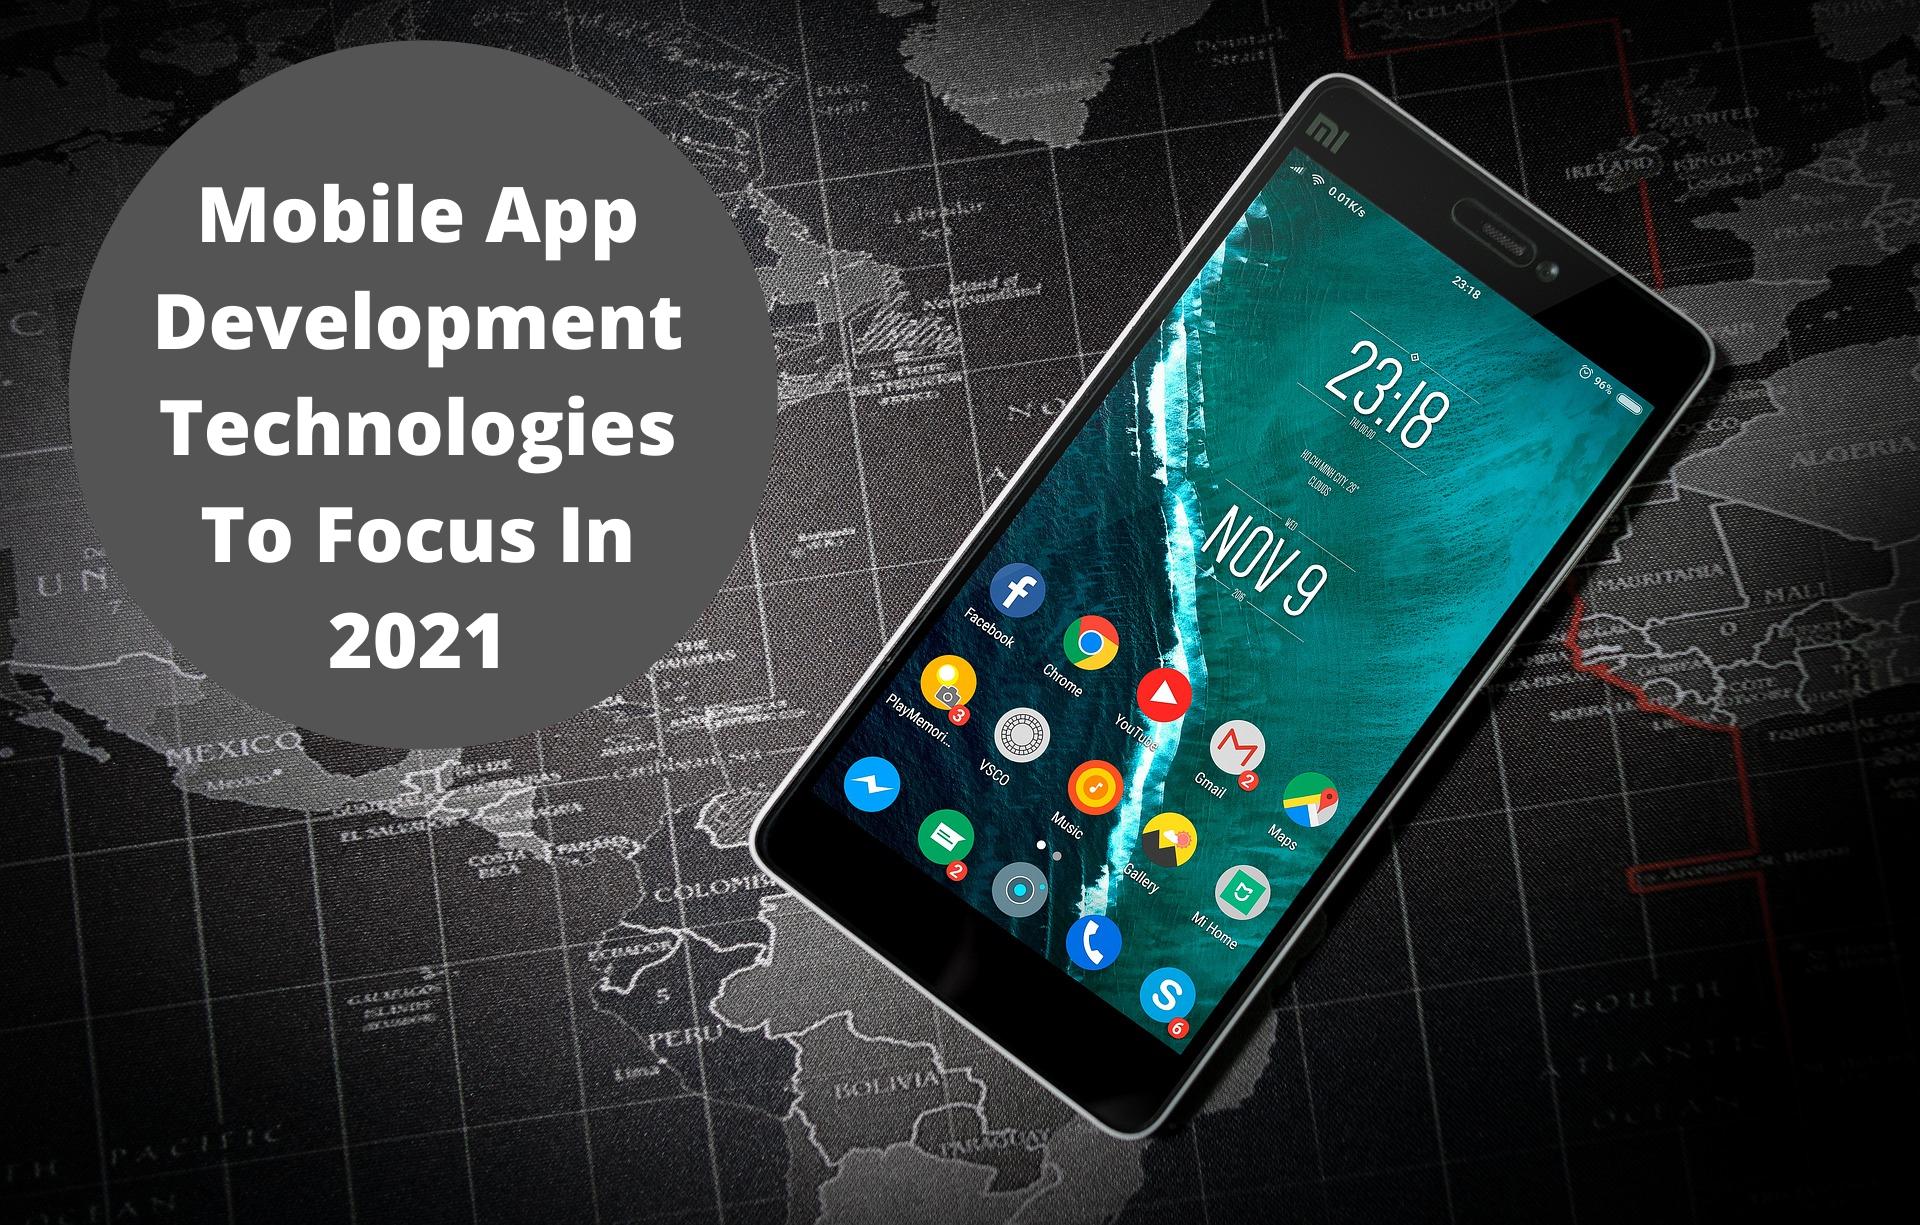 Mobile App Development Technologies To Focus In 2021